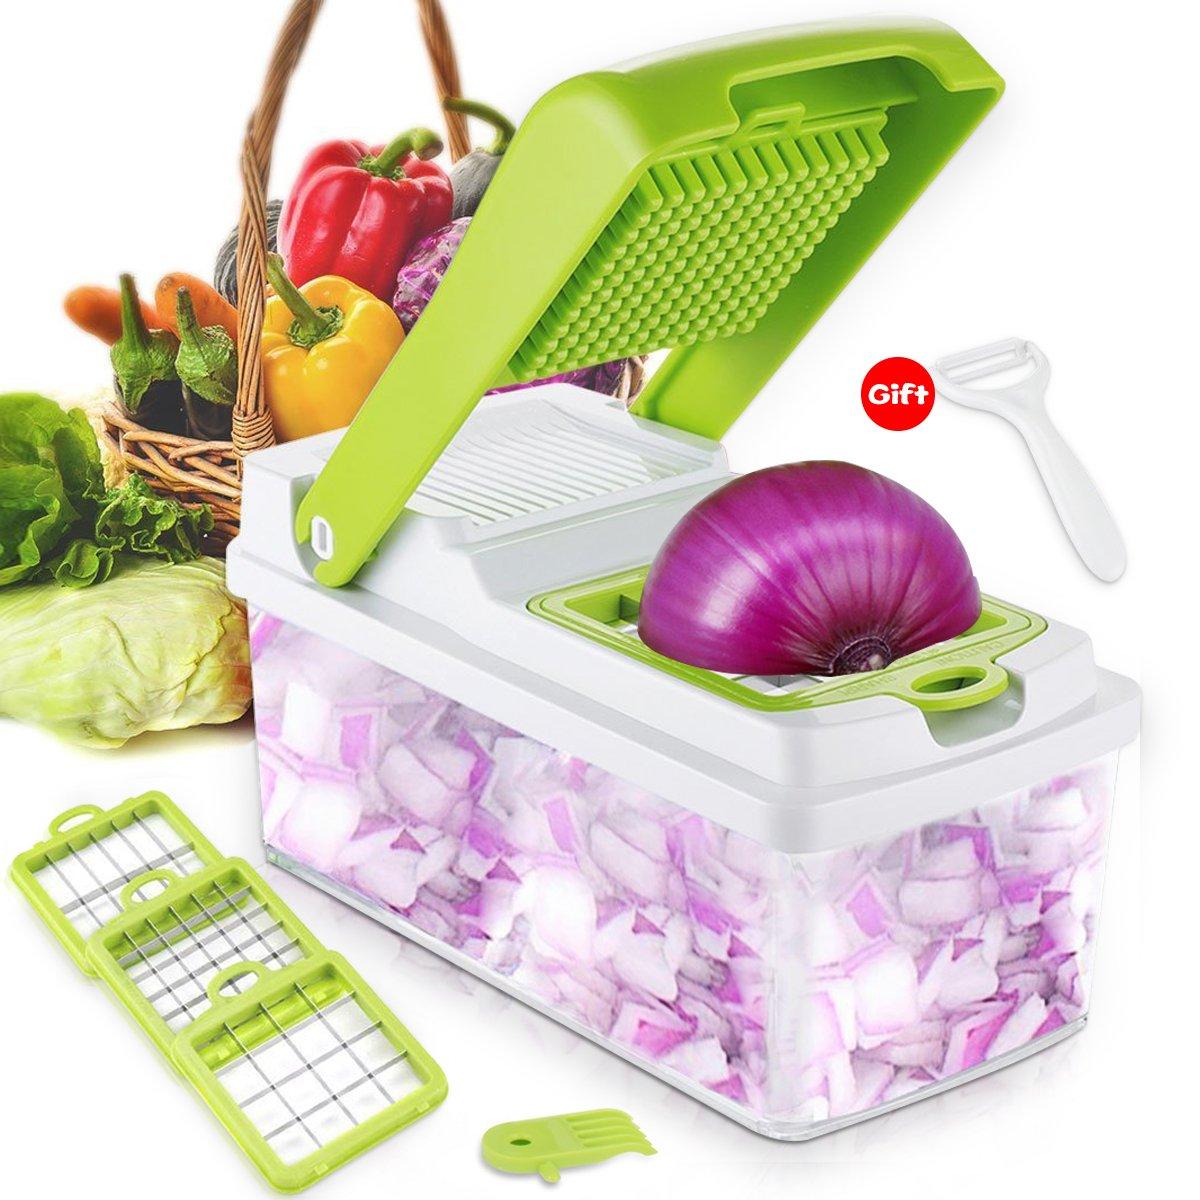 Vegetable Chopper Onion Slicer Grater Nicer Dicer Veggie Cutter Cuber with Food Container 3 Blades Set and Peeler for Fruit Salad